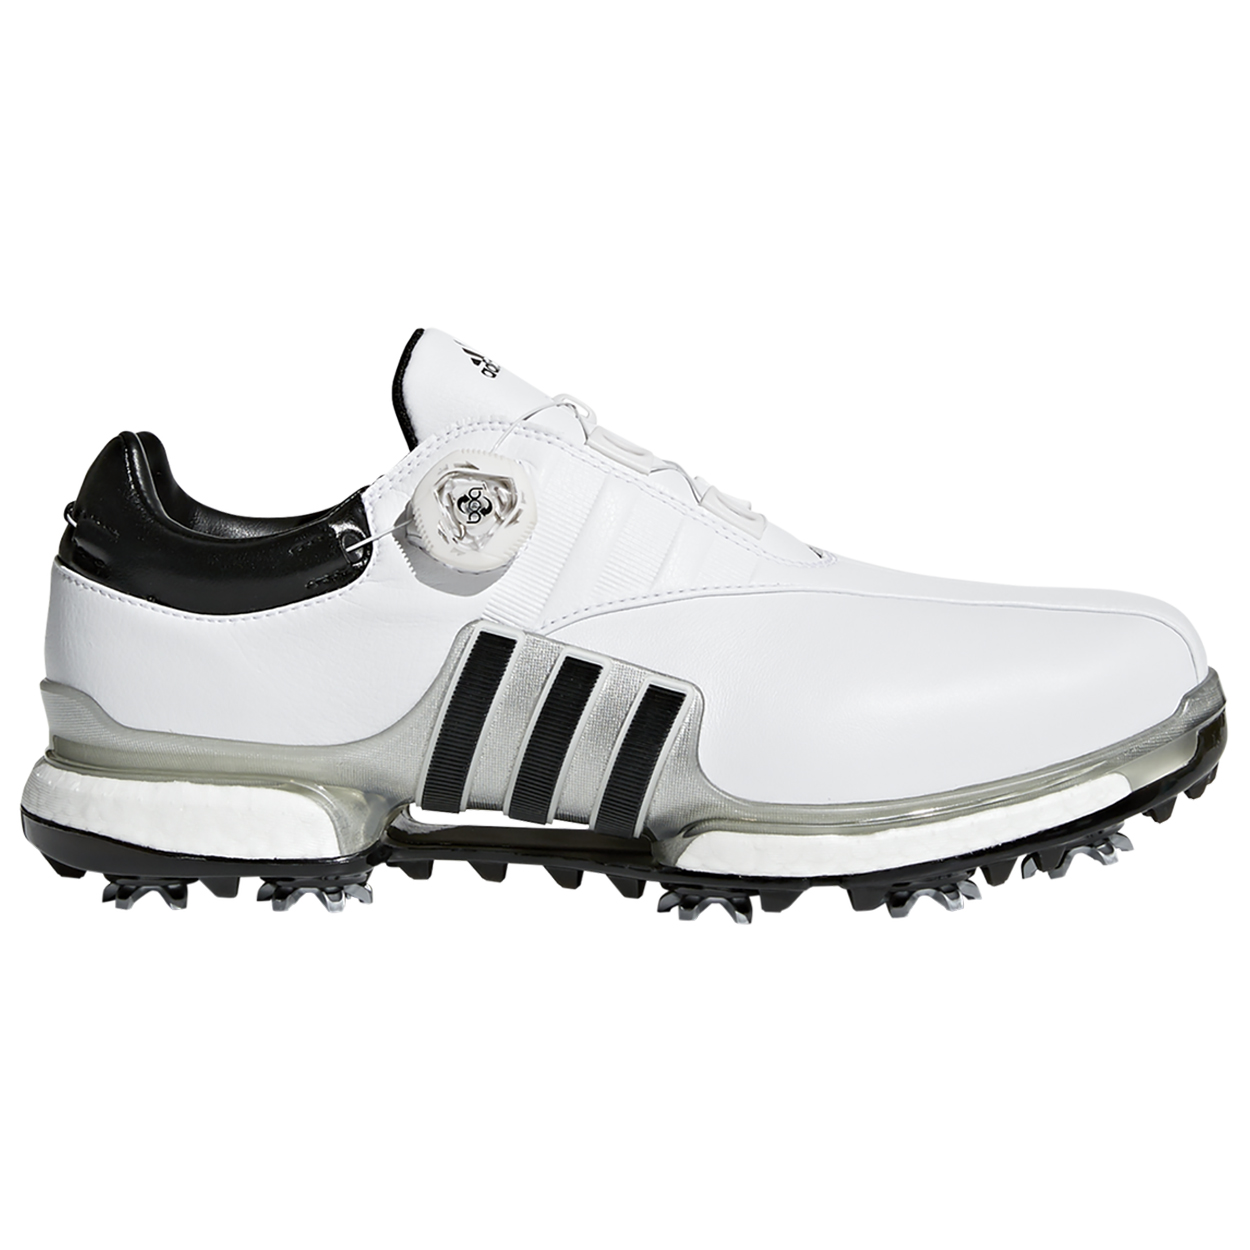 Adidas-Men-039-s-Tour-360-EQT-Boa-Golf-Shoes-Brand-New thumbnail 9